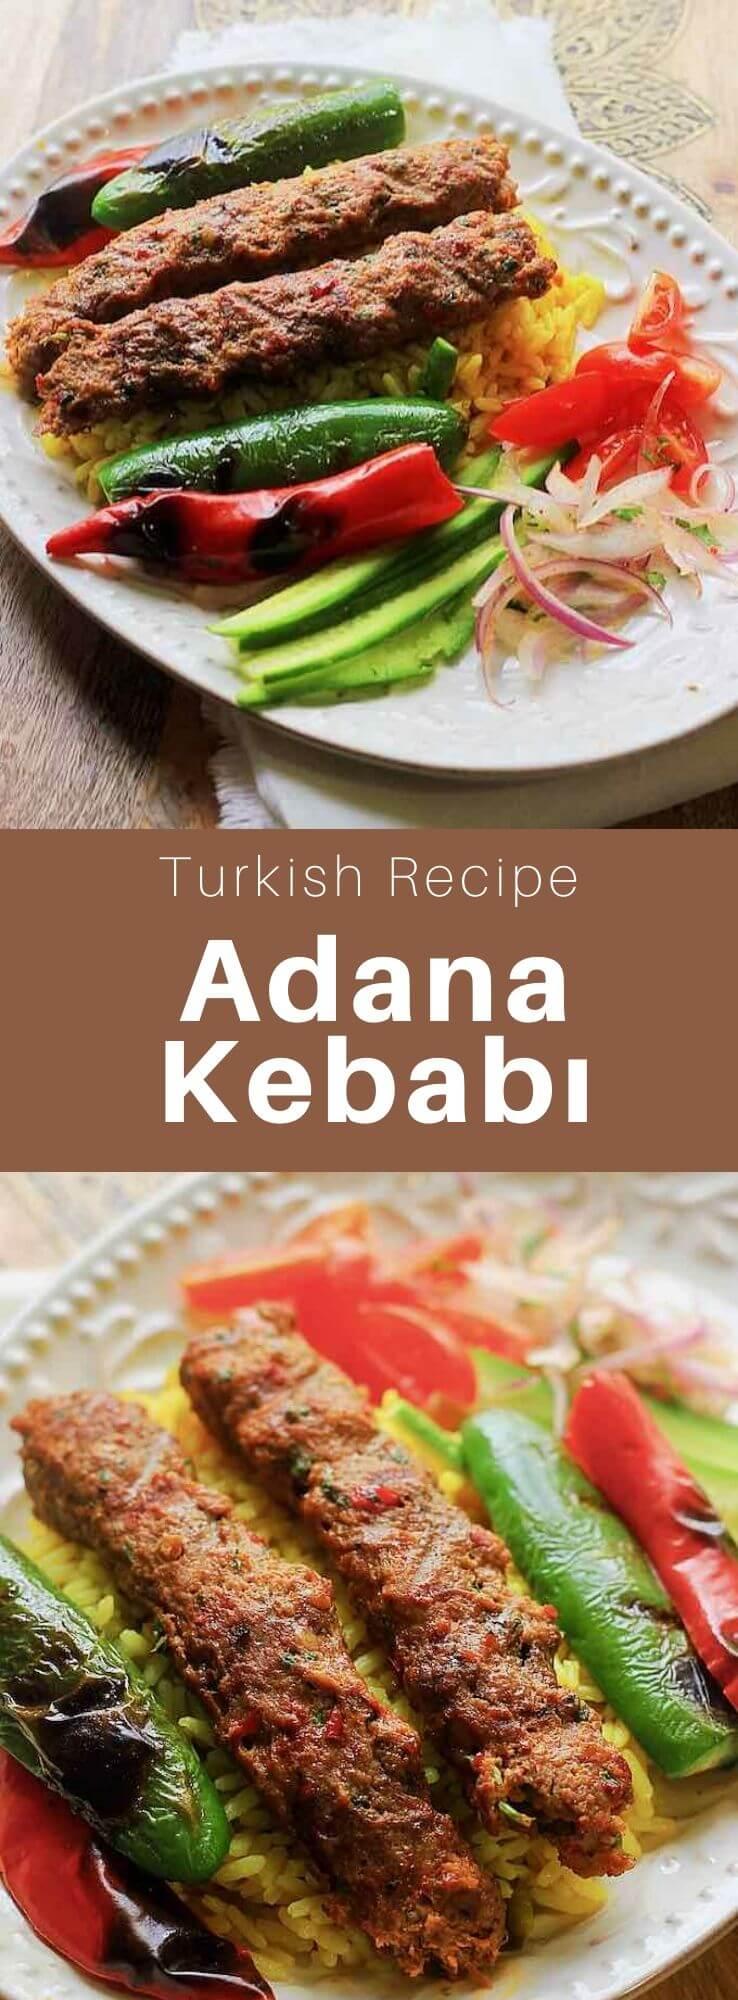 Adana kebab (Adana kebabı), also known as kıyma kebabı, is a long skewer of ground mutton, and mutton tail fat, grilled on a charcoal barbecue. #Turkey #Turkish #TurkishRecipe #TurkishFood #TurkishCuisine #WorldCuisine #196flavors